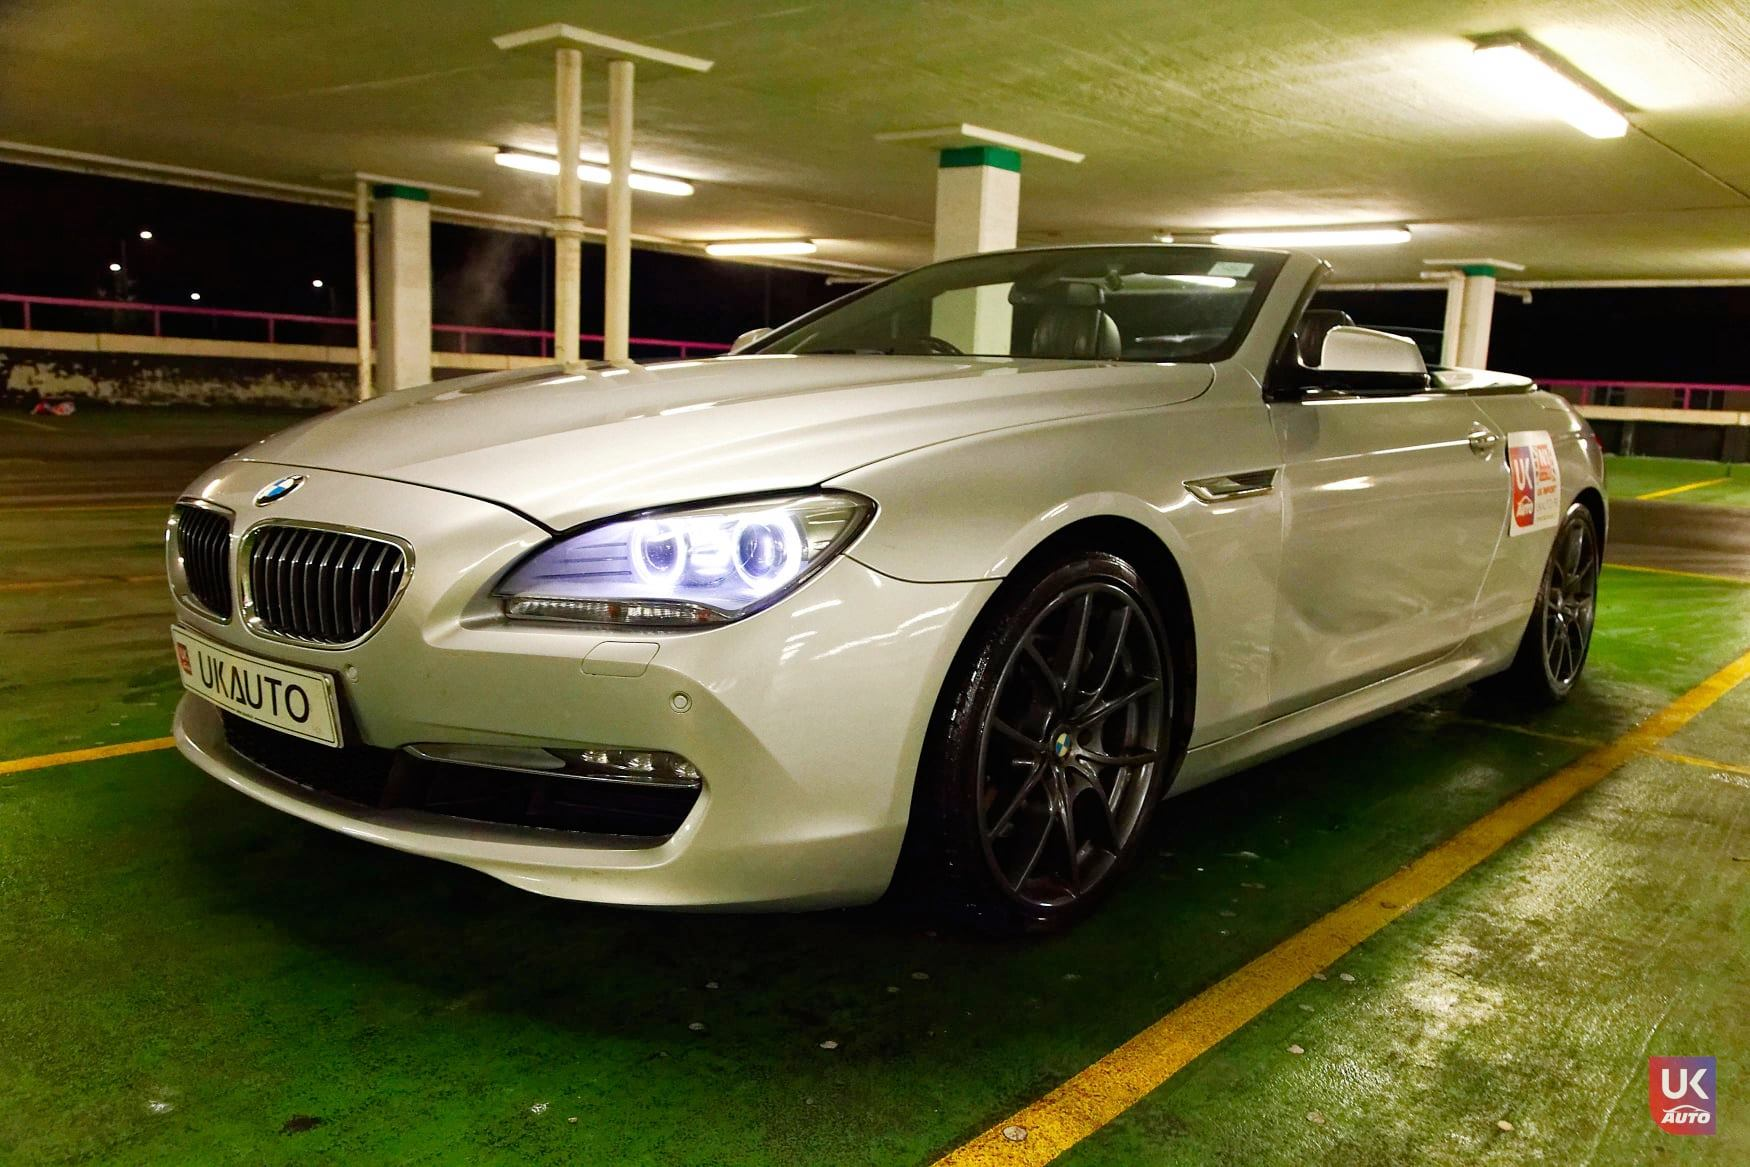 Importer voiture angleterre brexit 2021 BMW3 - Importer voiture angleterre brexit 2021 BMW